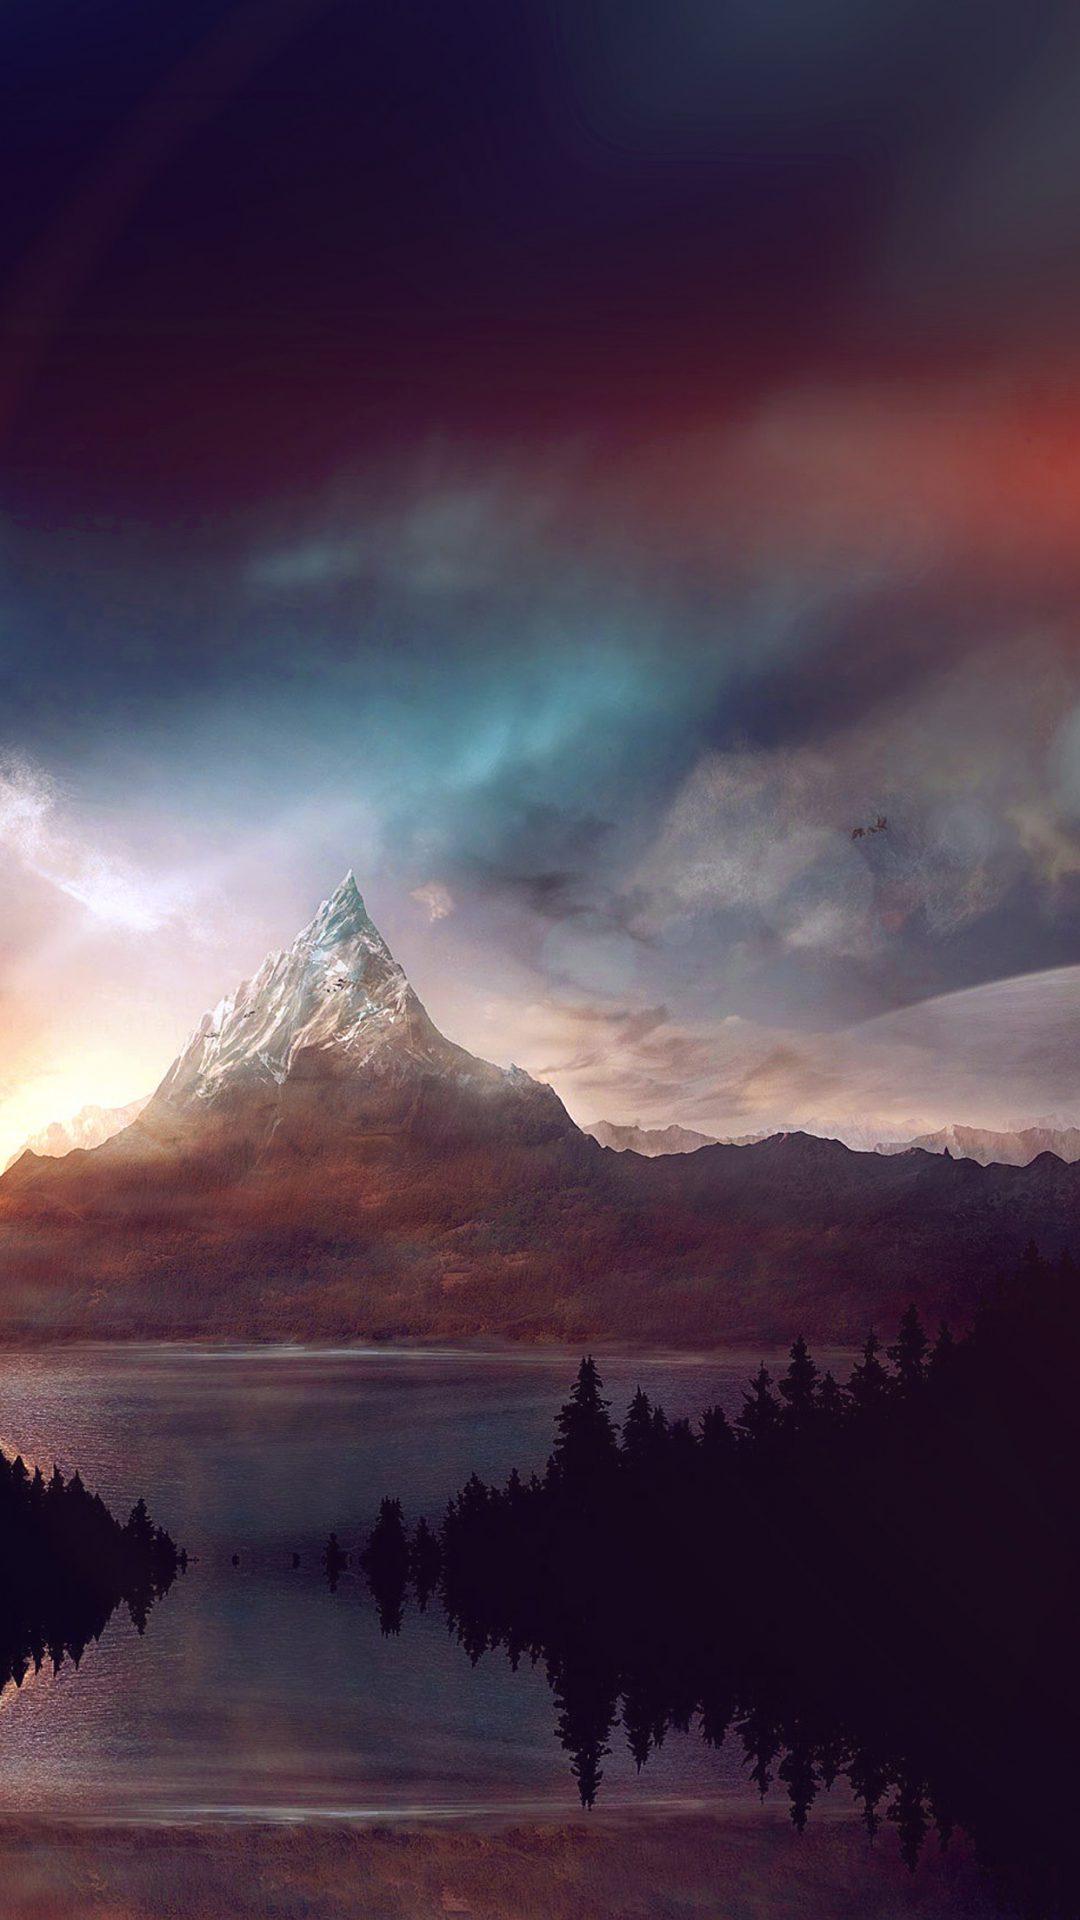 Mountain Nature Fantasy Art Illustration Flare